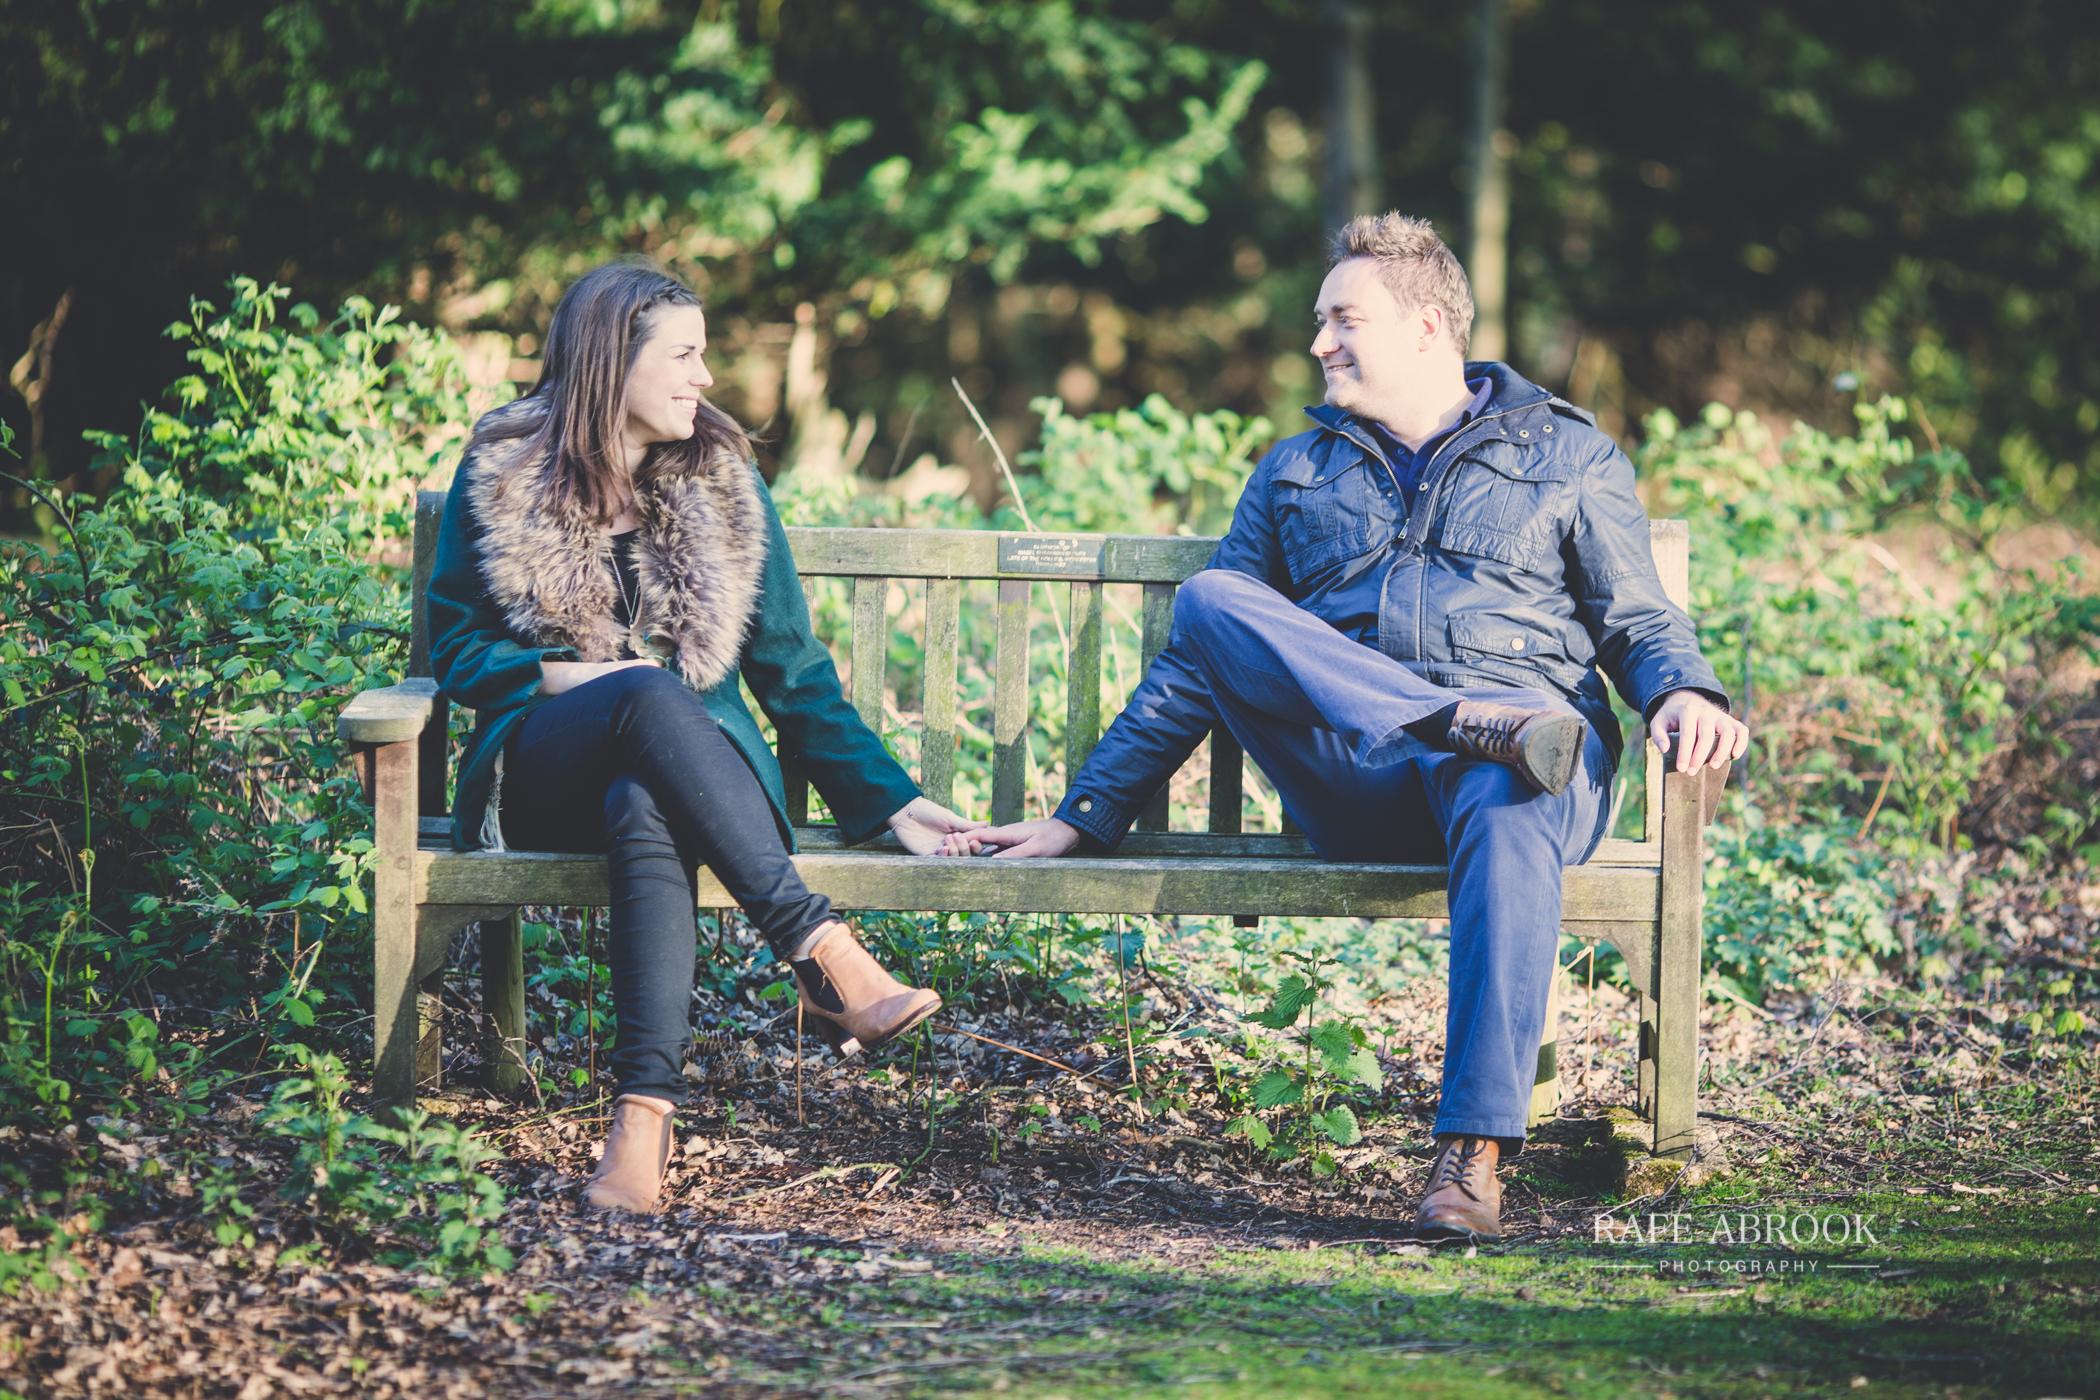 jon & laura engagement shoot rspb the lodge sandy bedfordshire-1015.jpg